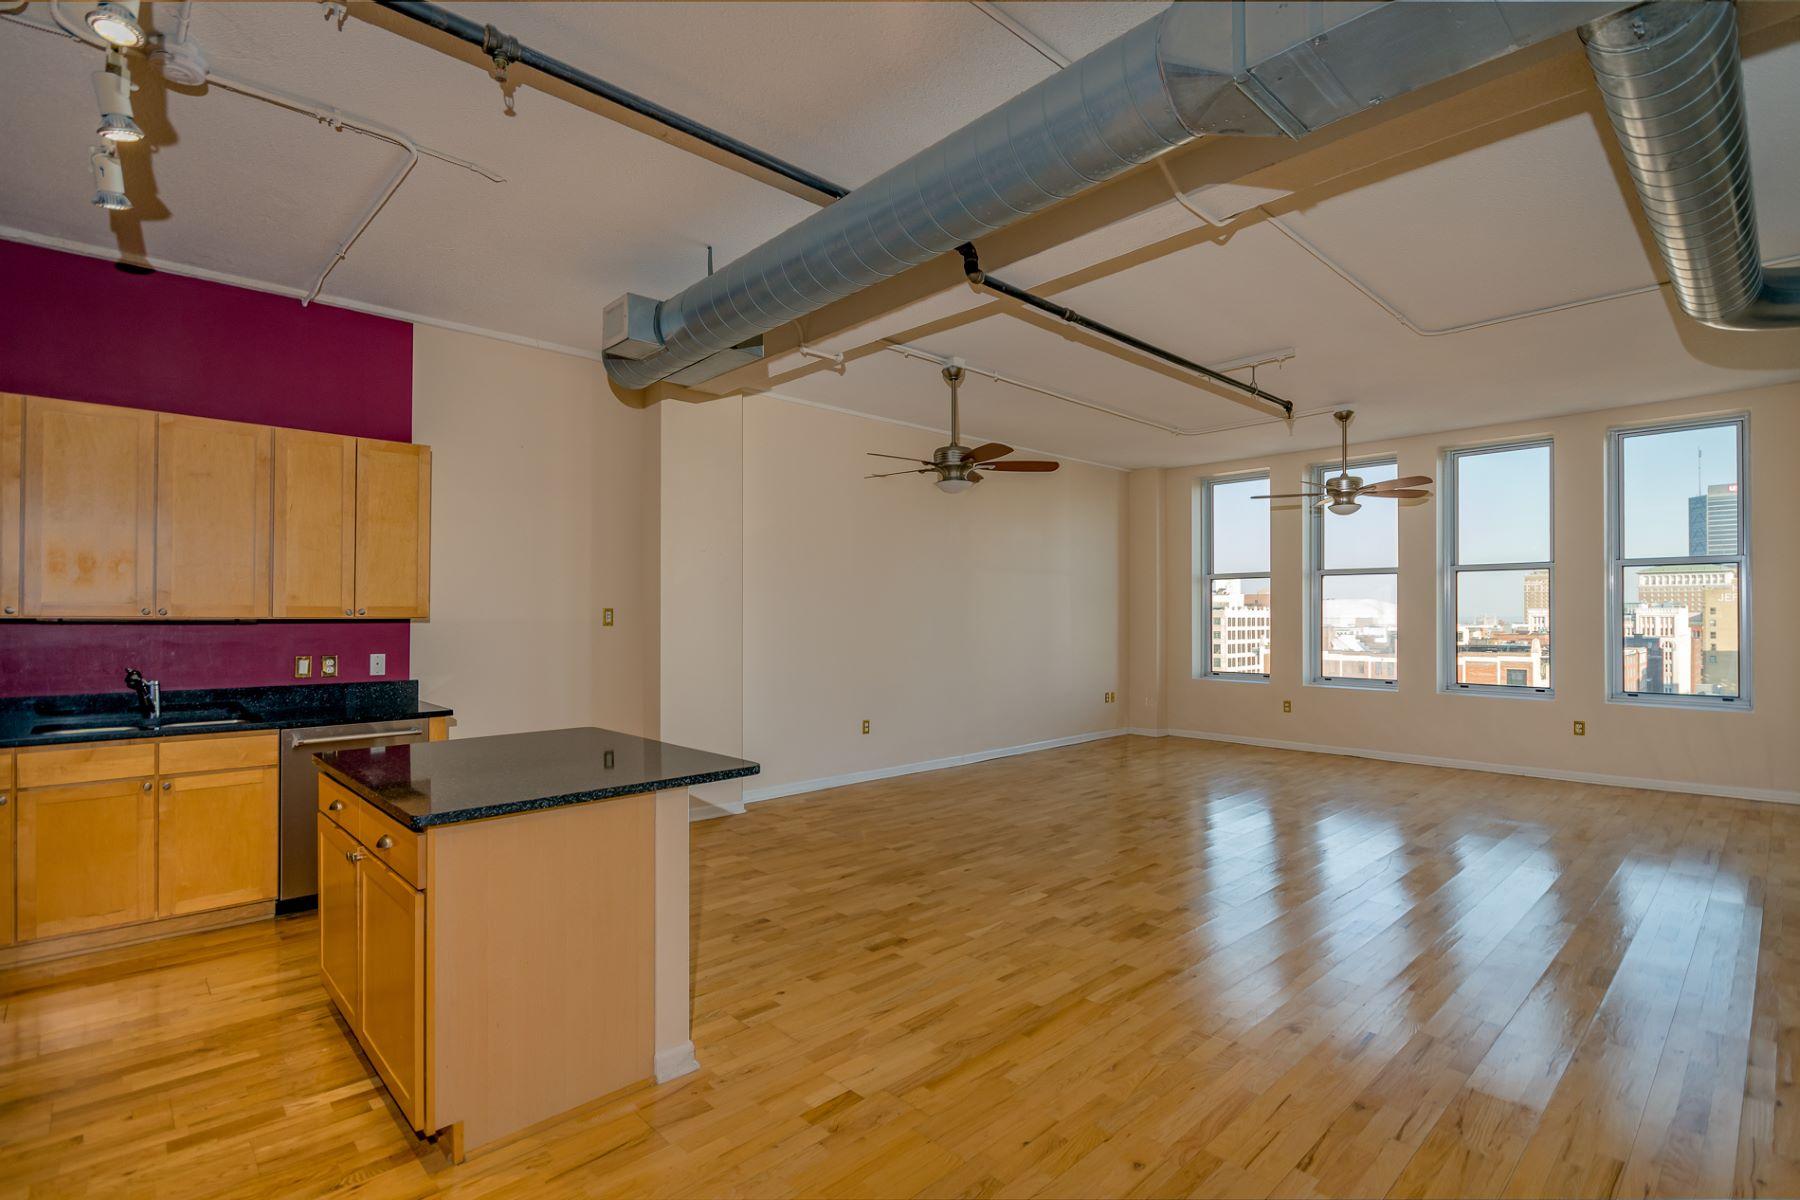 Additional photo for property listing at Locust Street 1501 Locust Street # 1005 St. Louis, Missouri 63103 United States